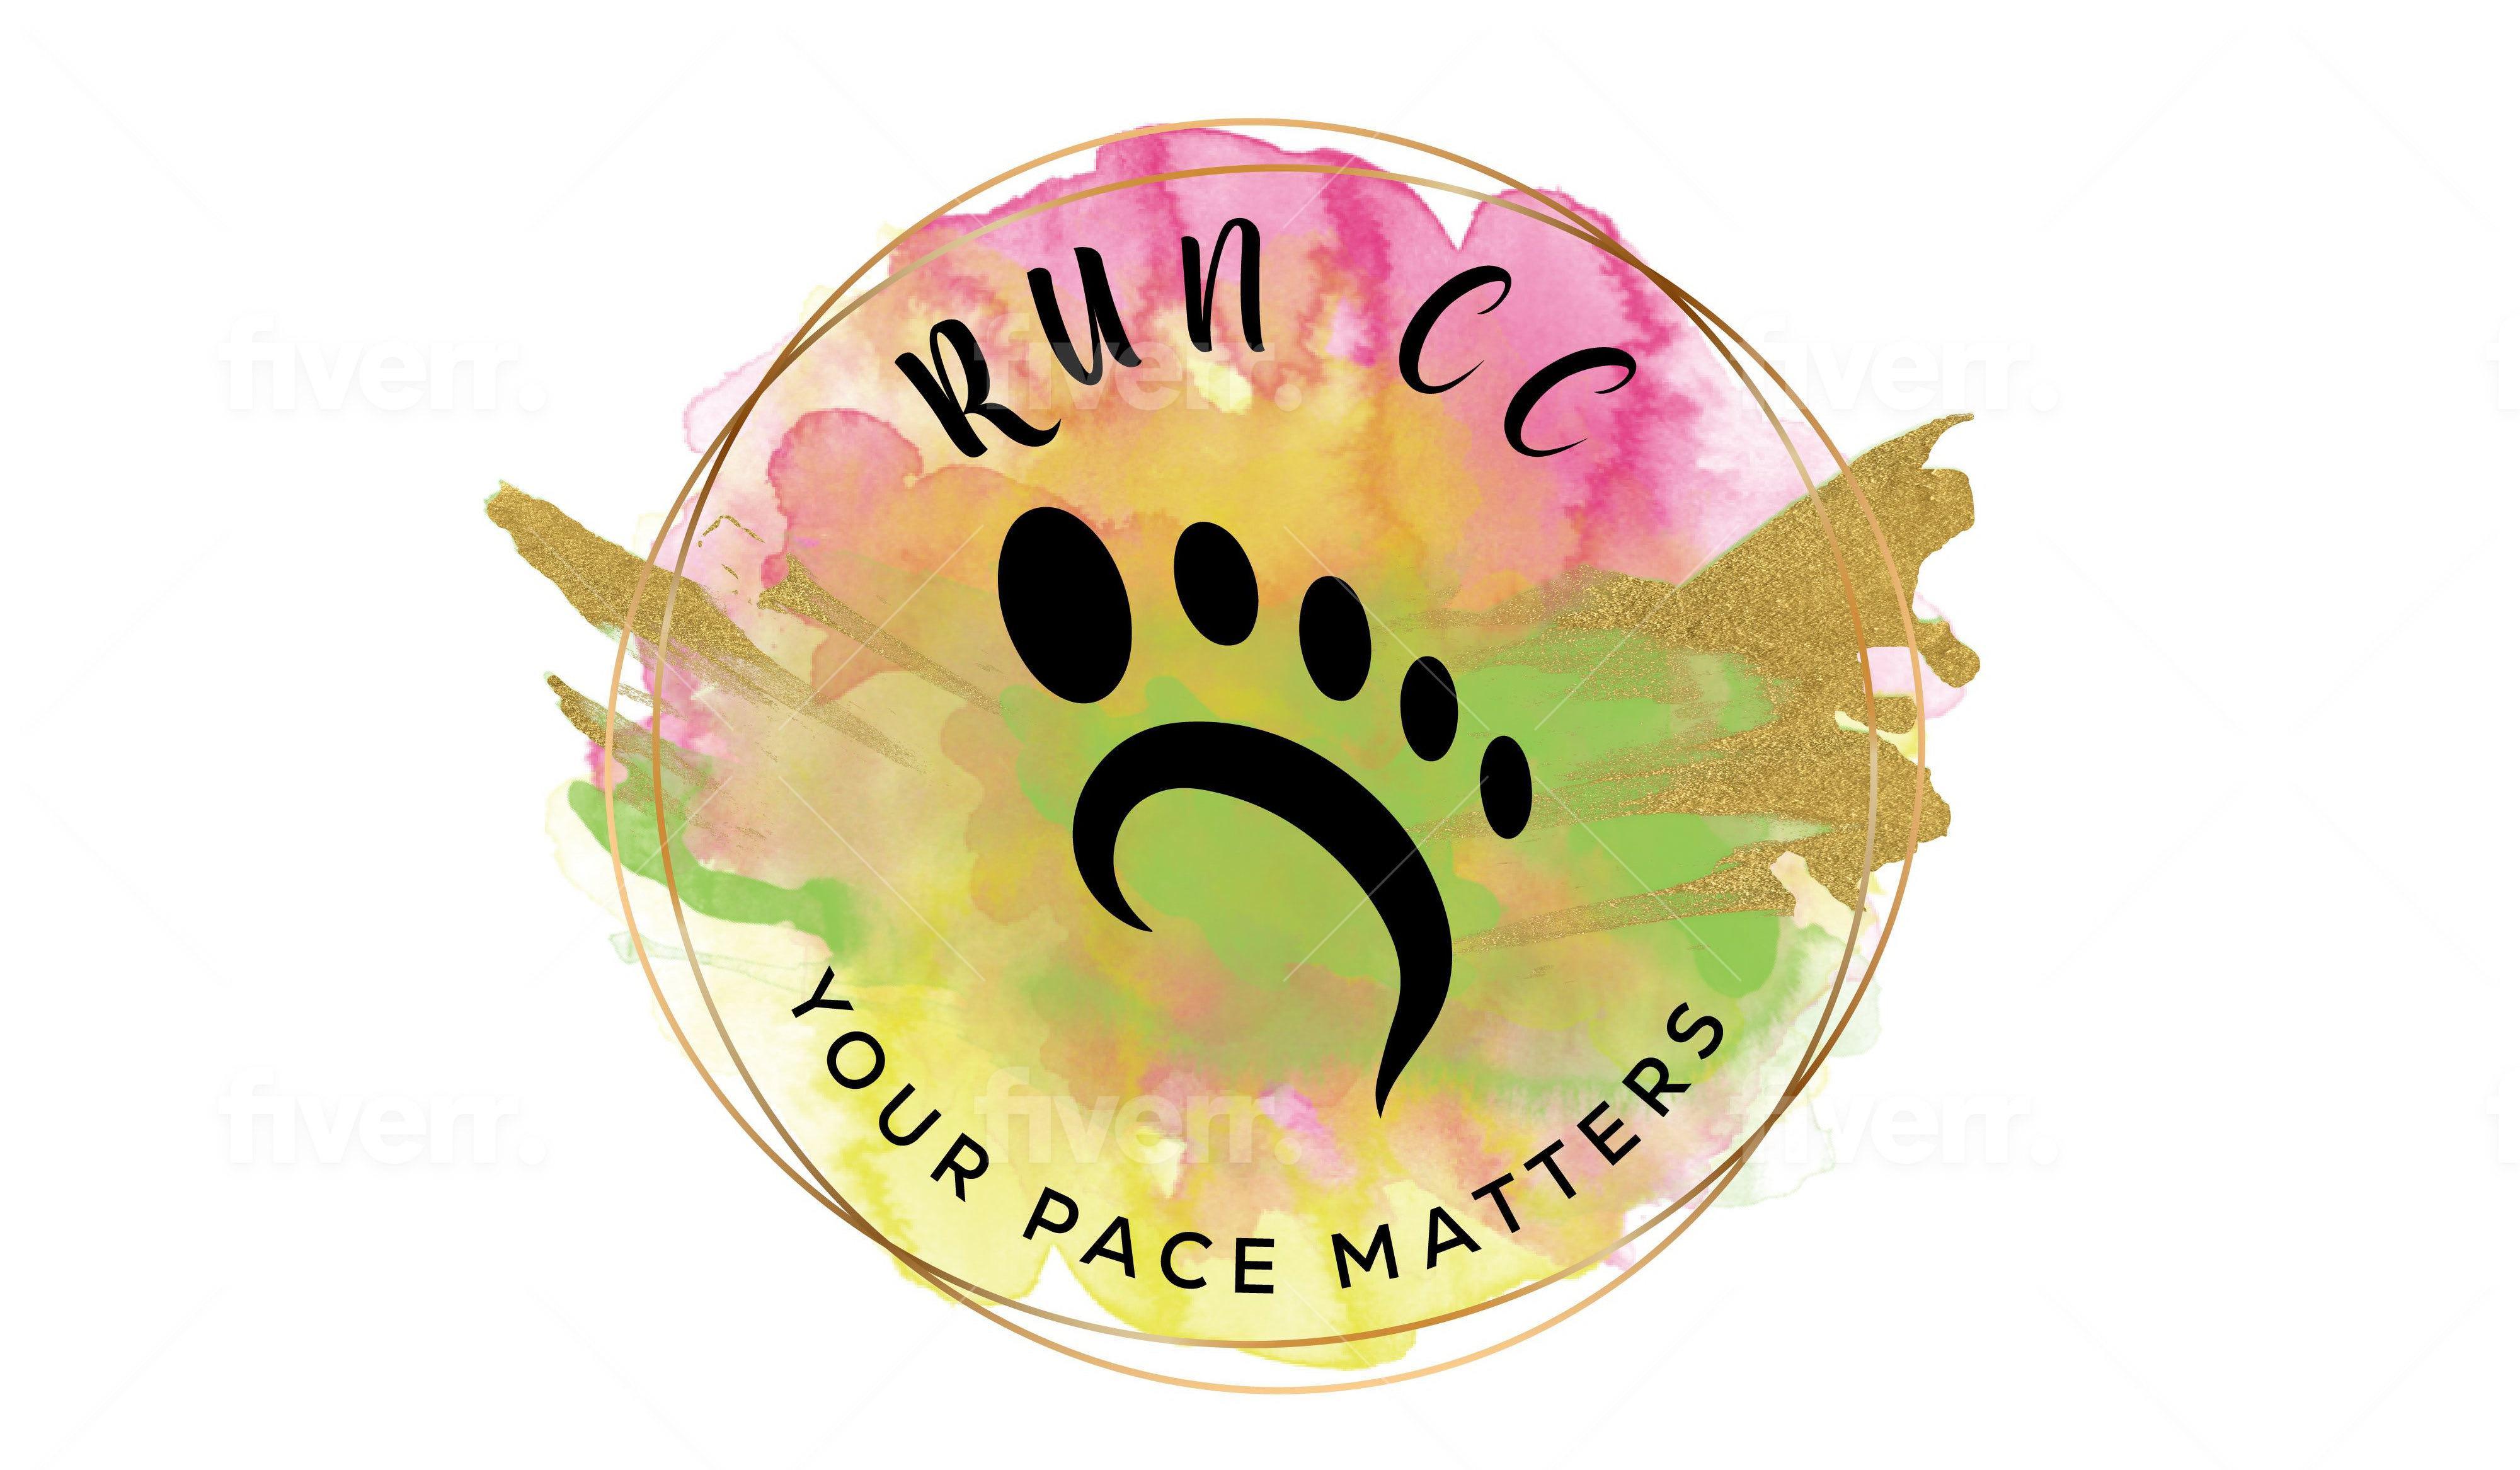 Trademark Logo RUNCC YOUR PACE MATTERS